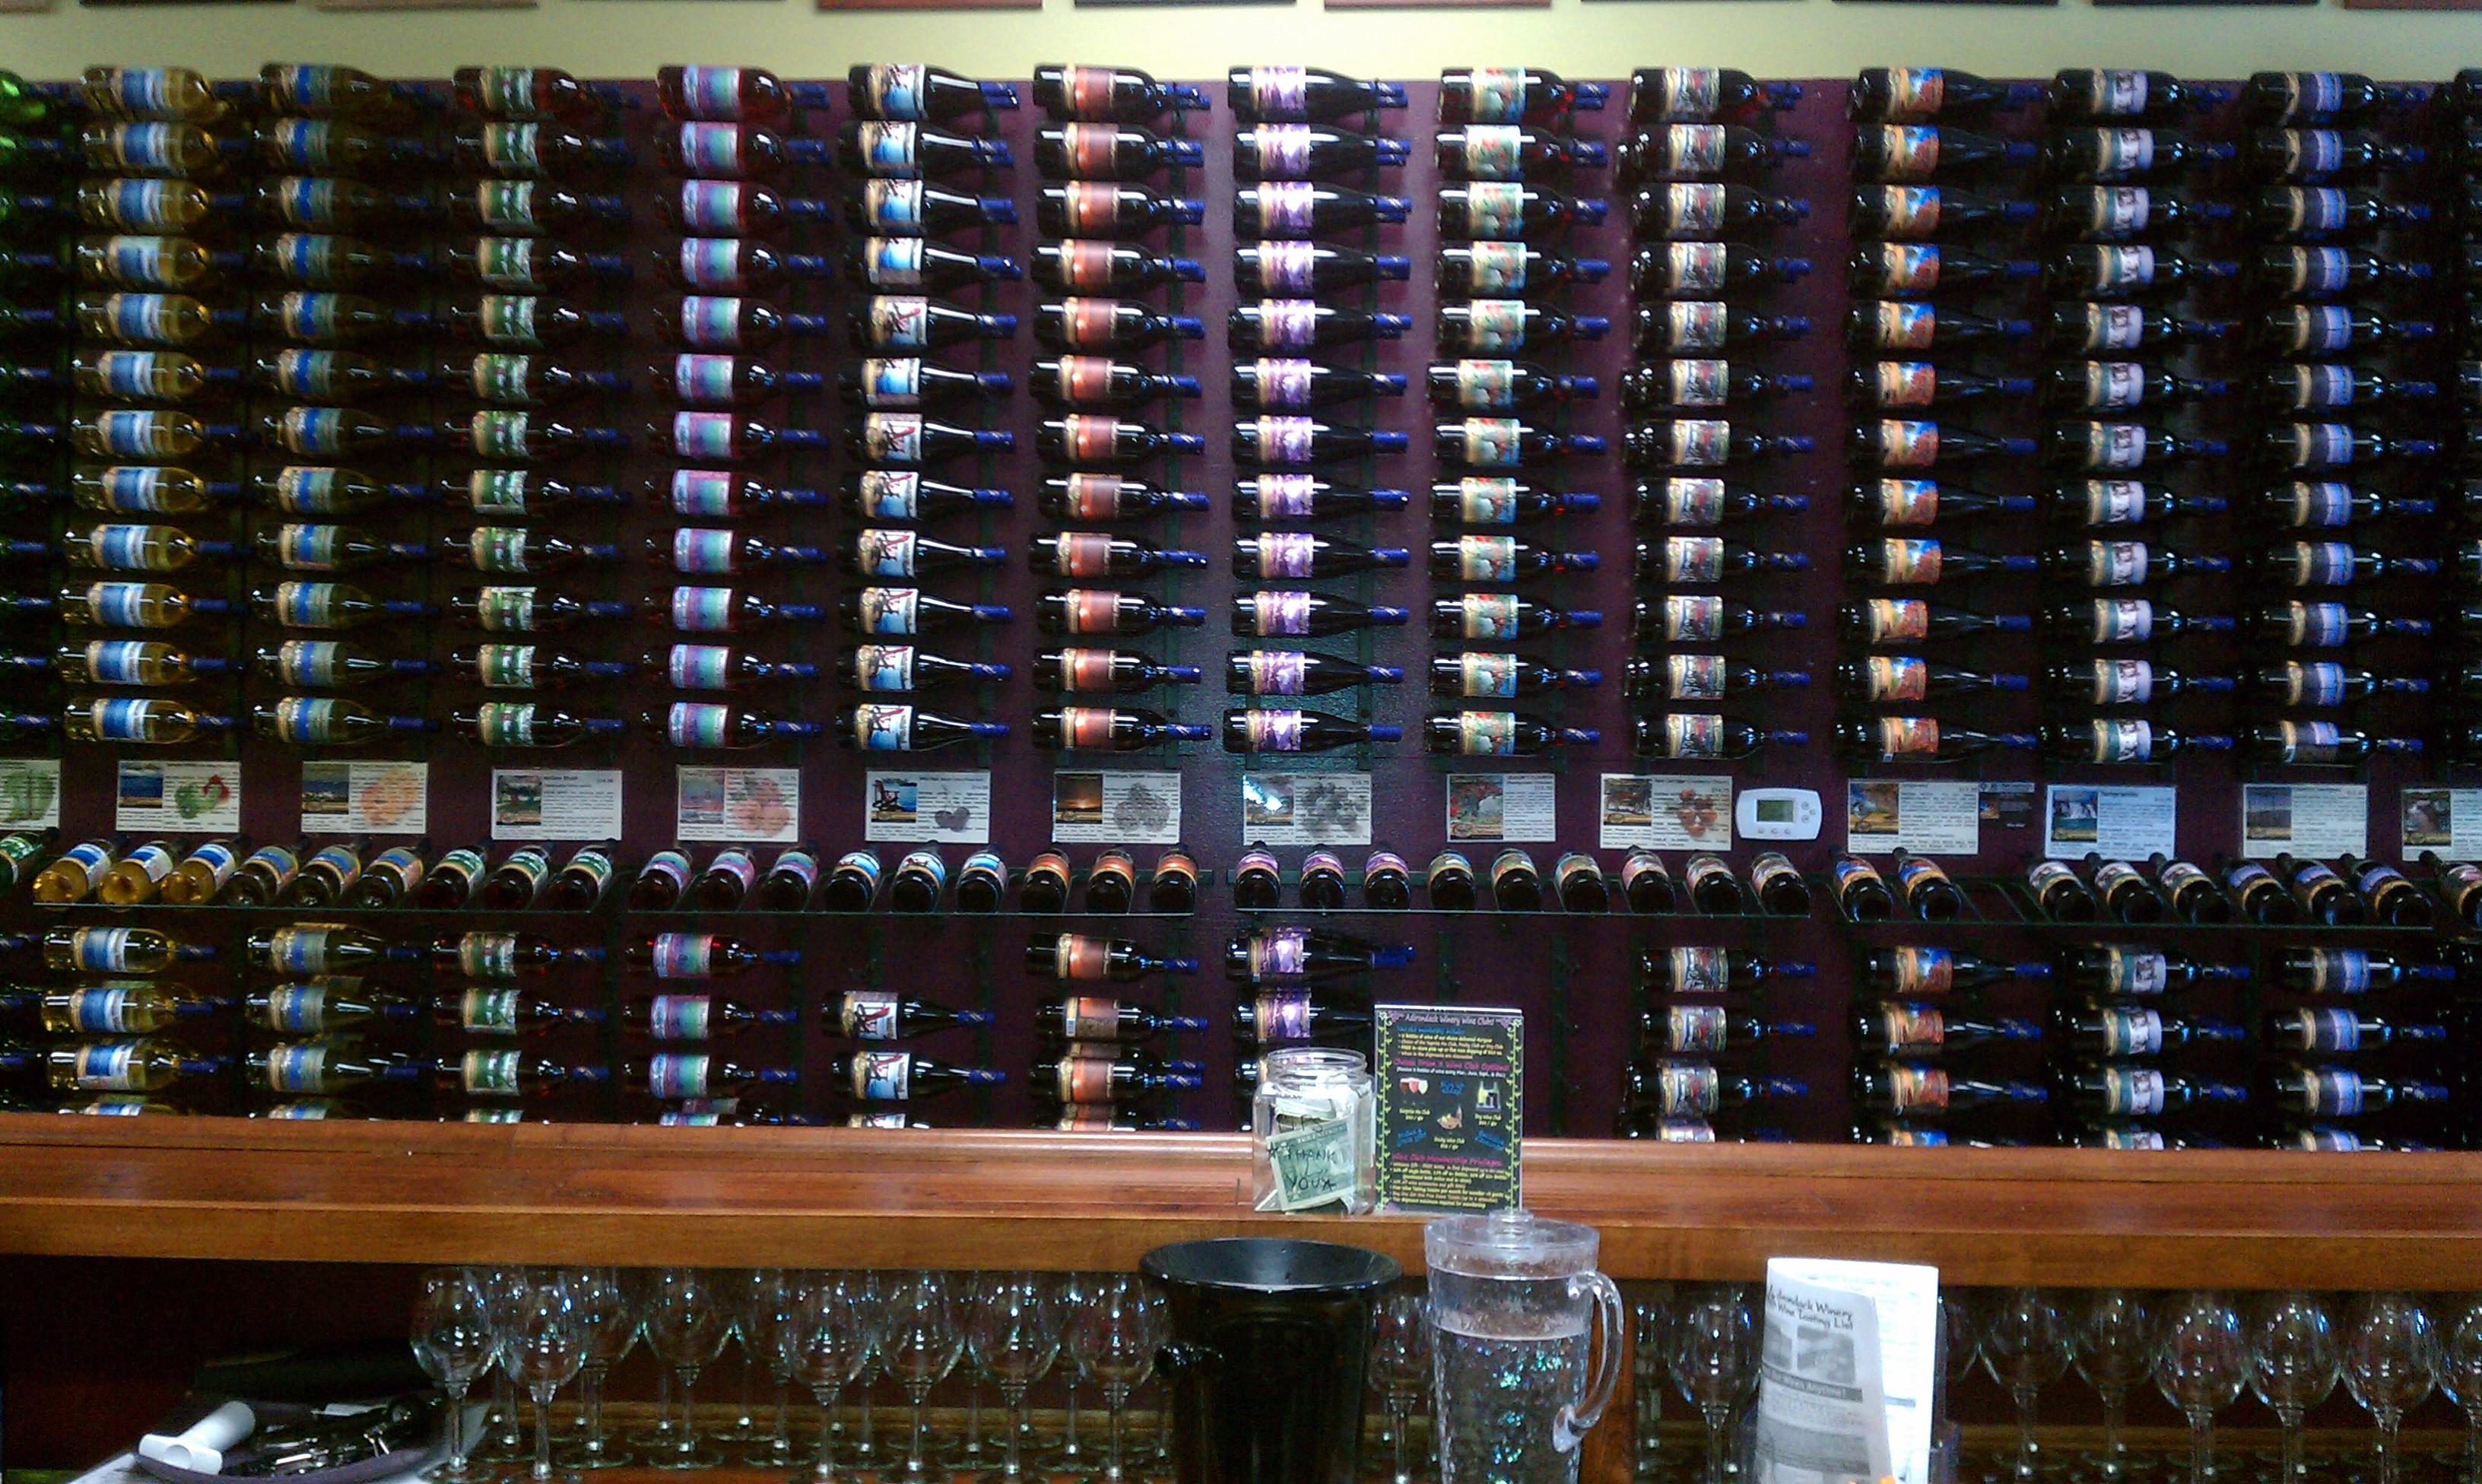 REVIEW: Adirondack Winery, Lake George [PHOTOS]